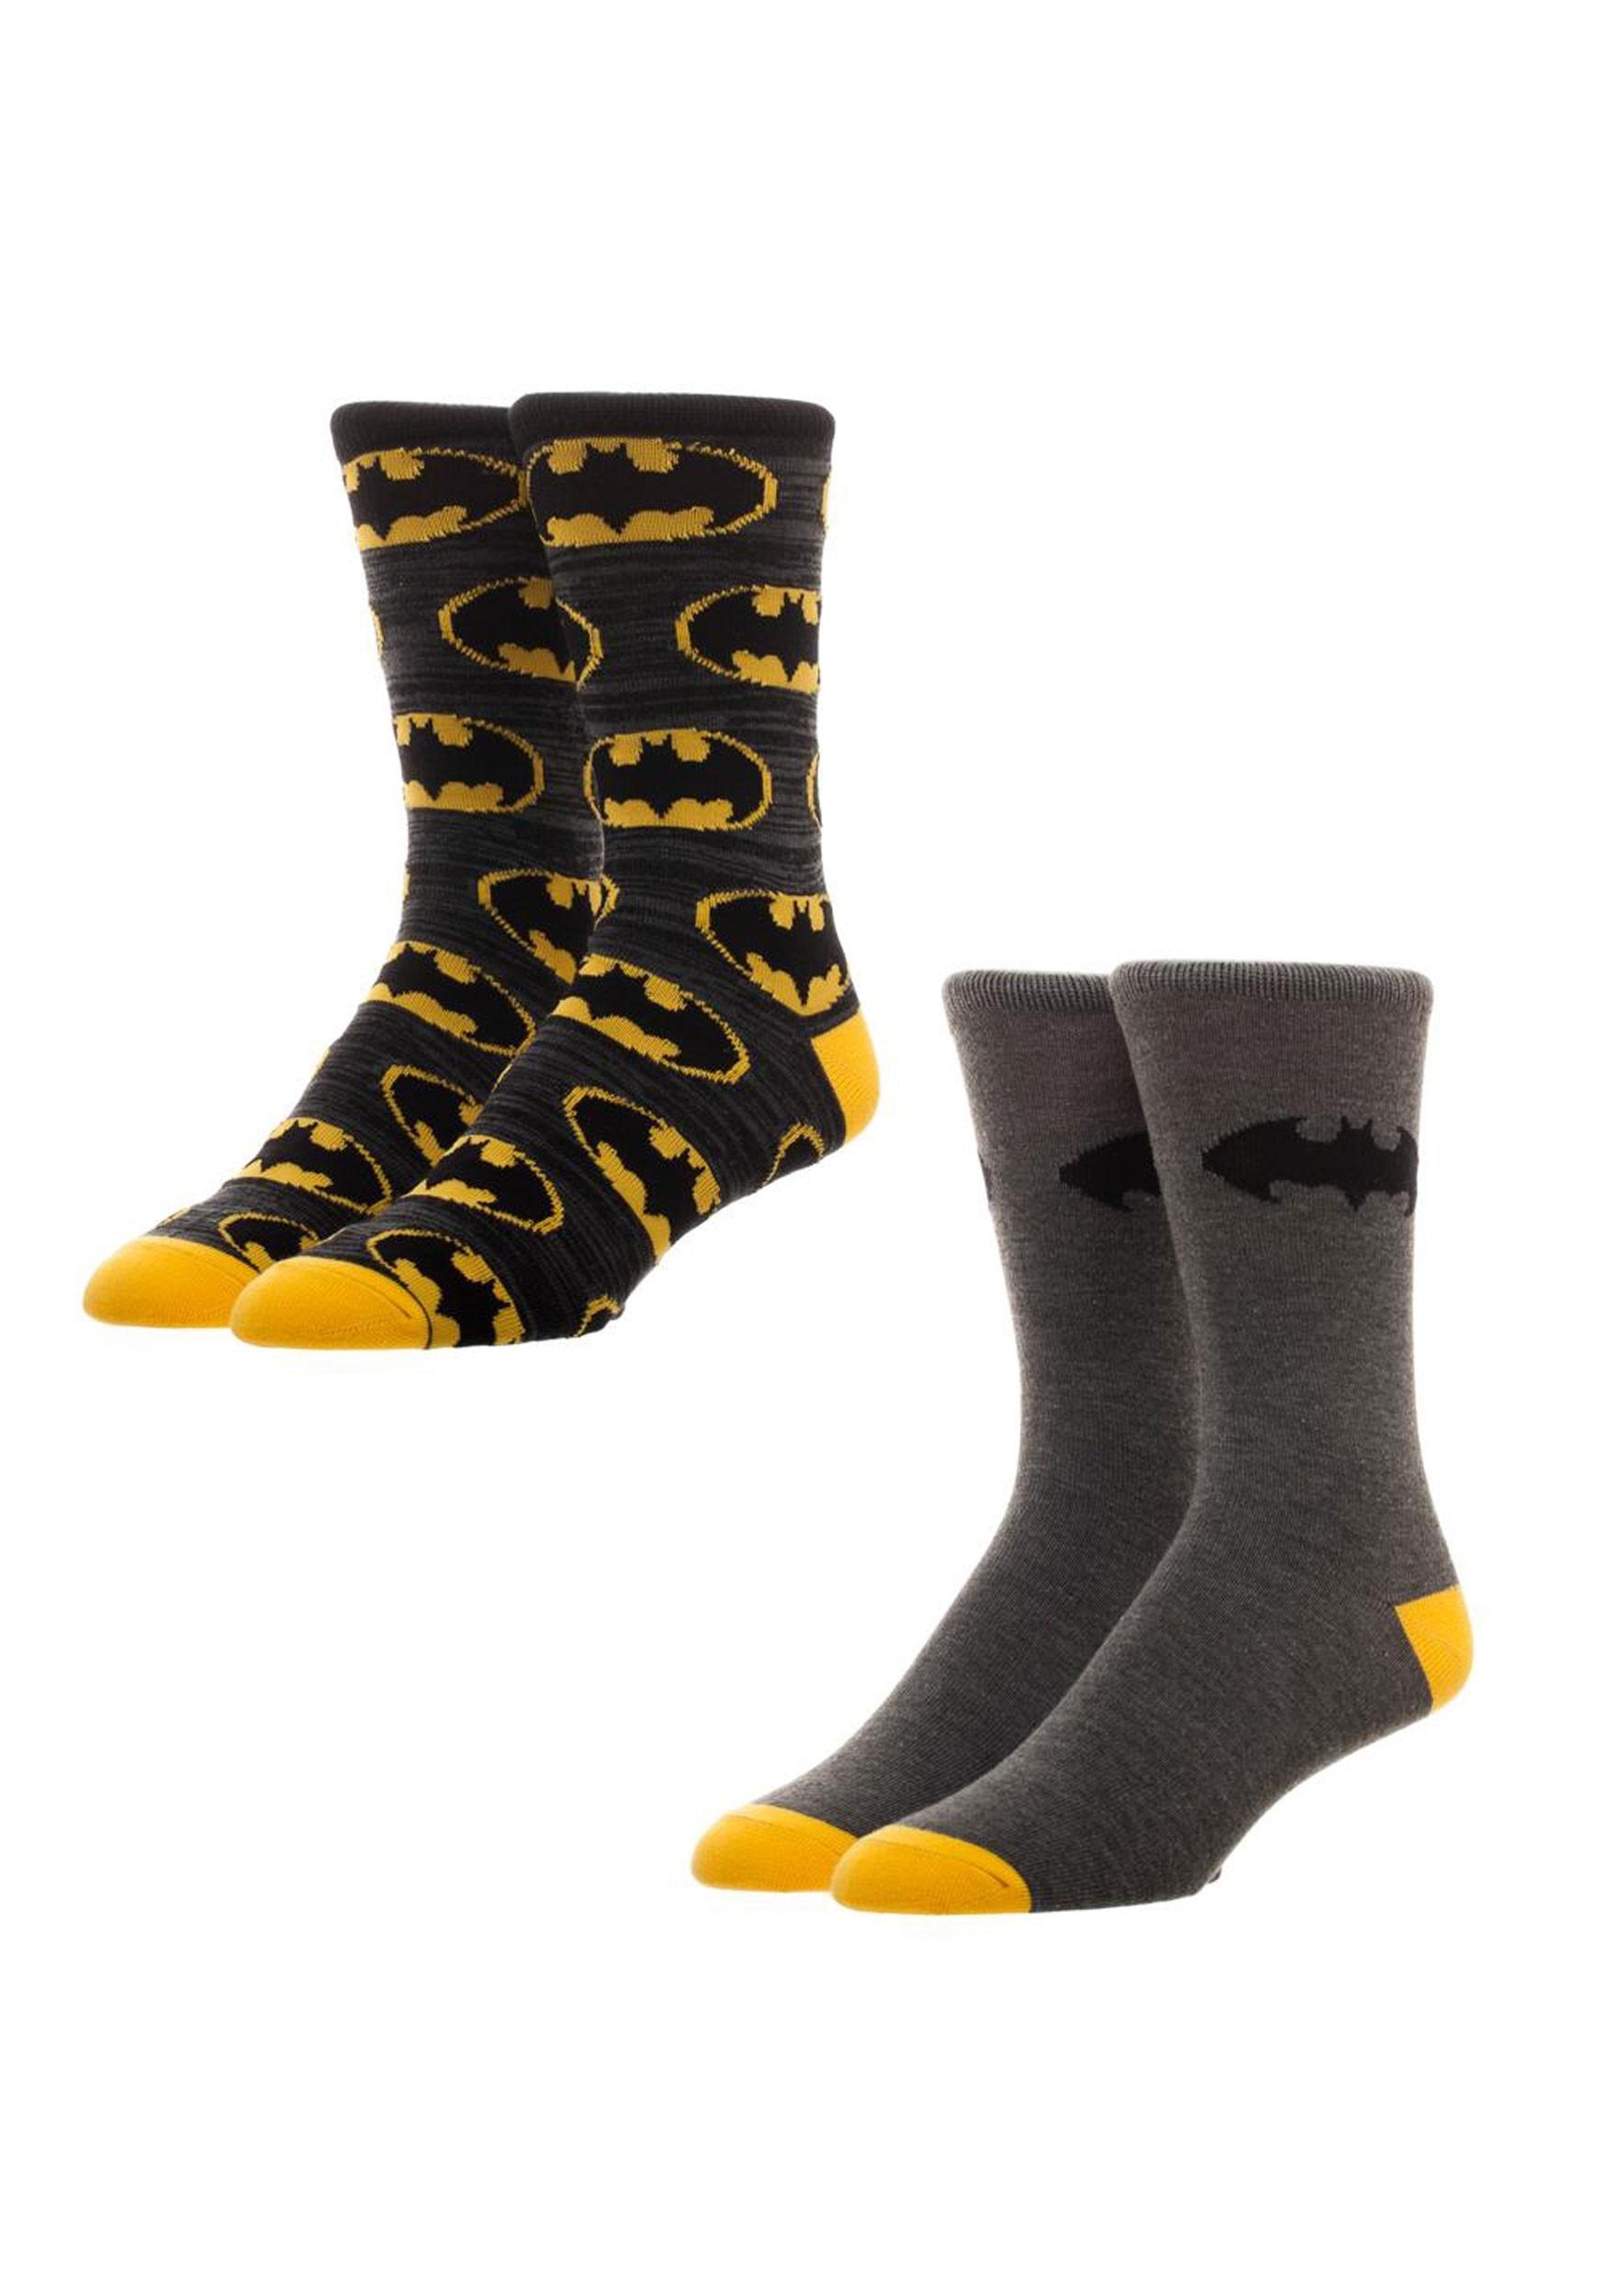 Batman 2 Pack Crew Socks BWXS5TOTBTM00PP00